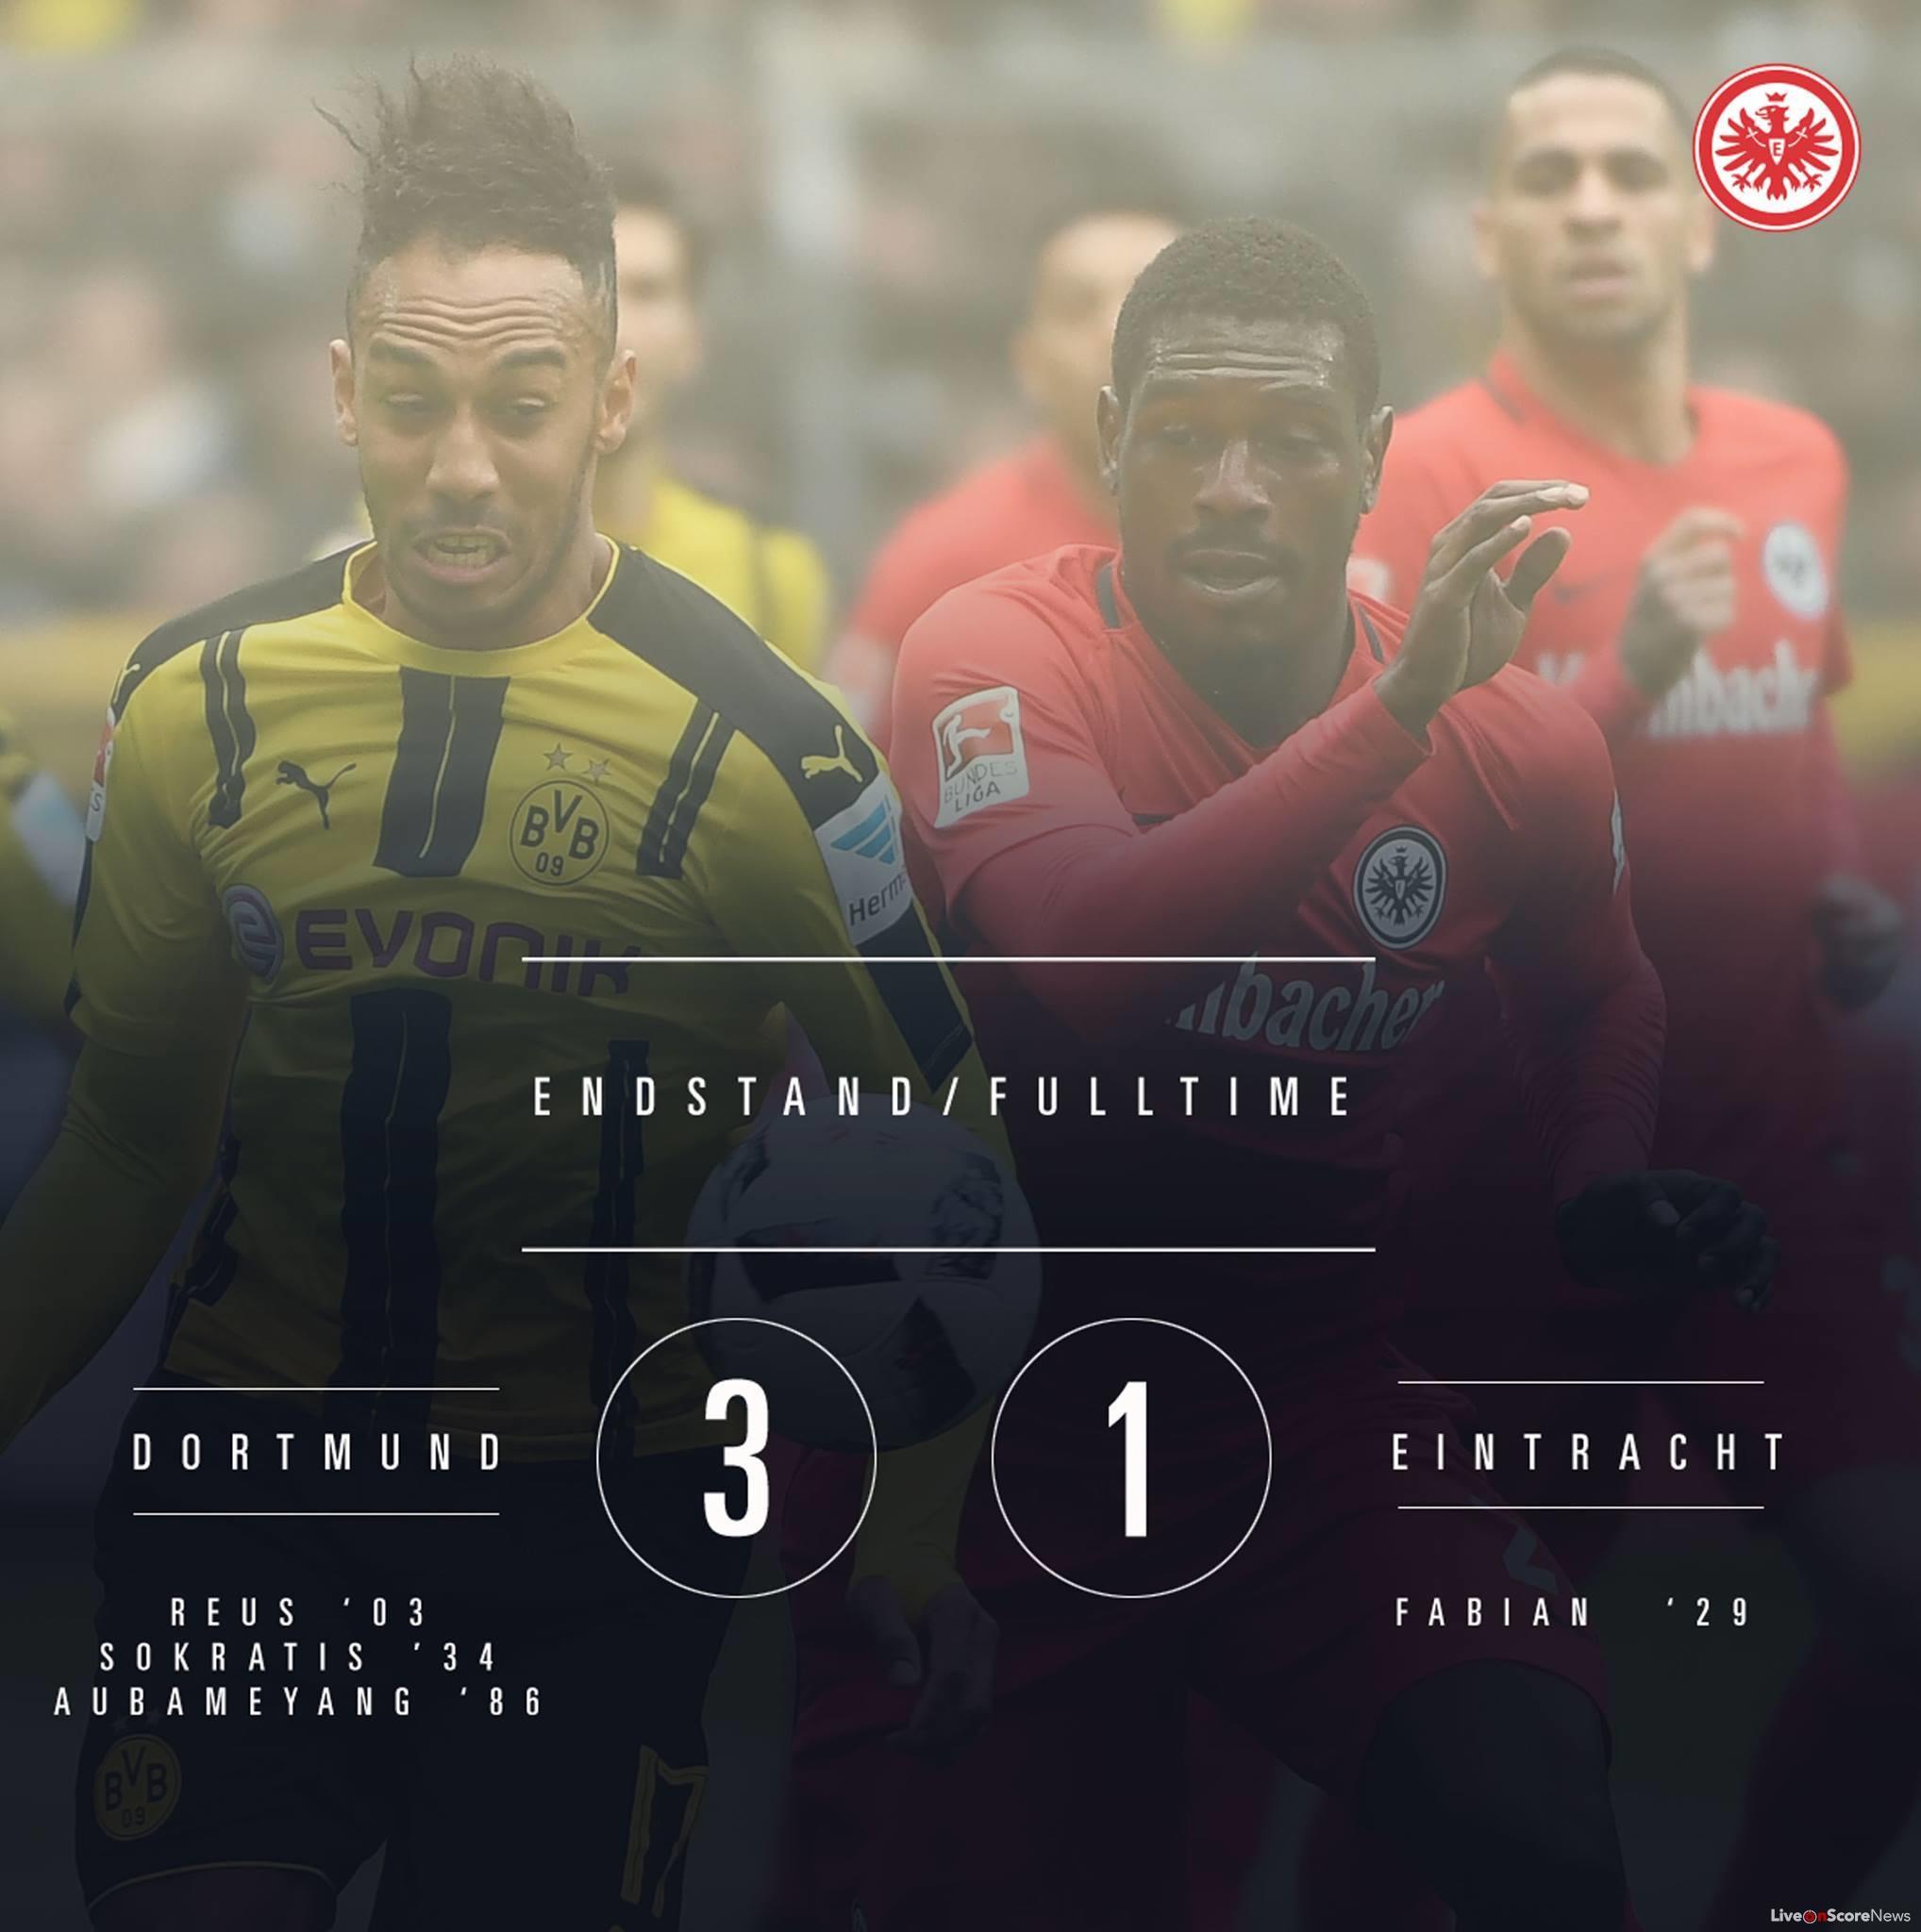 1 Eintracht Frankfurt Highlight